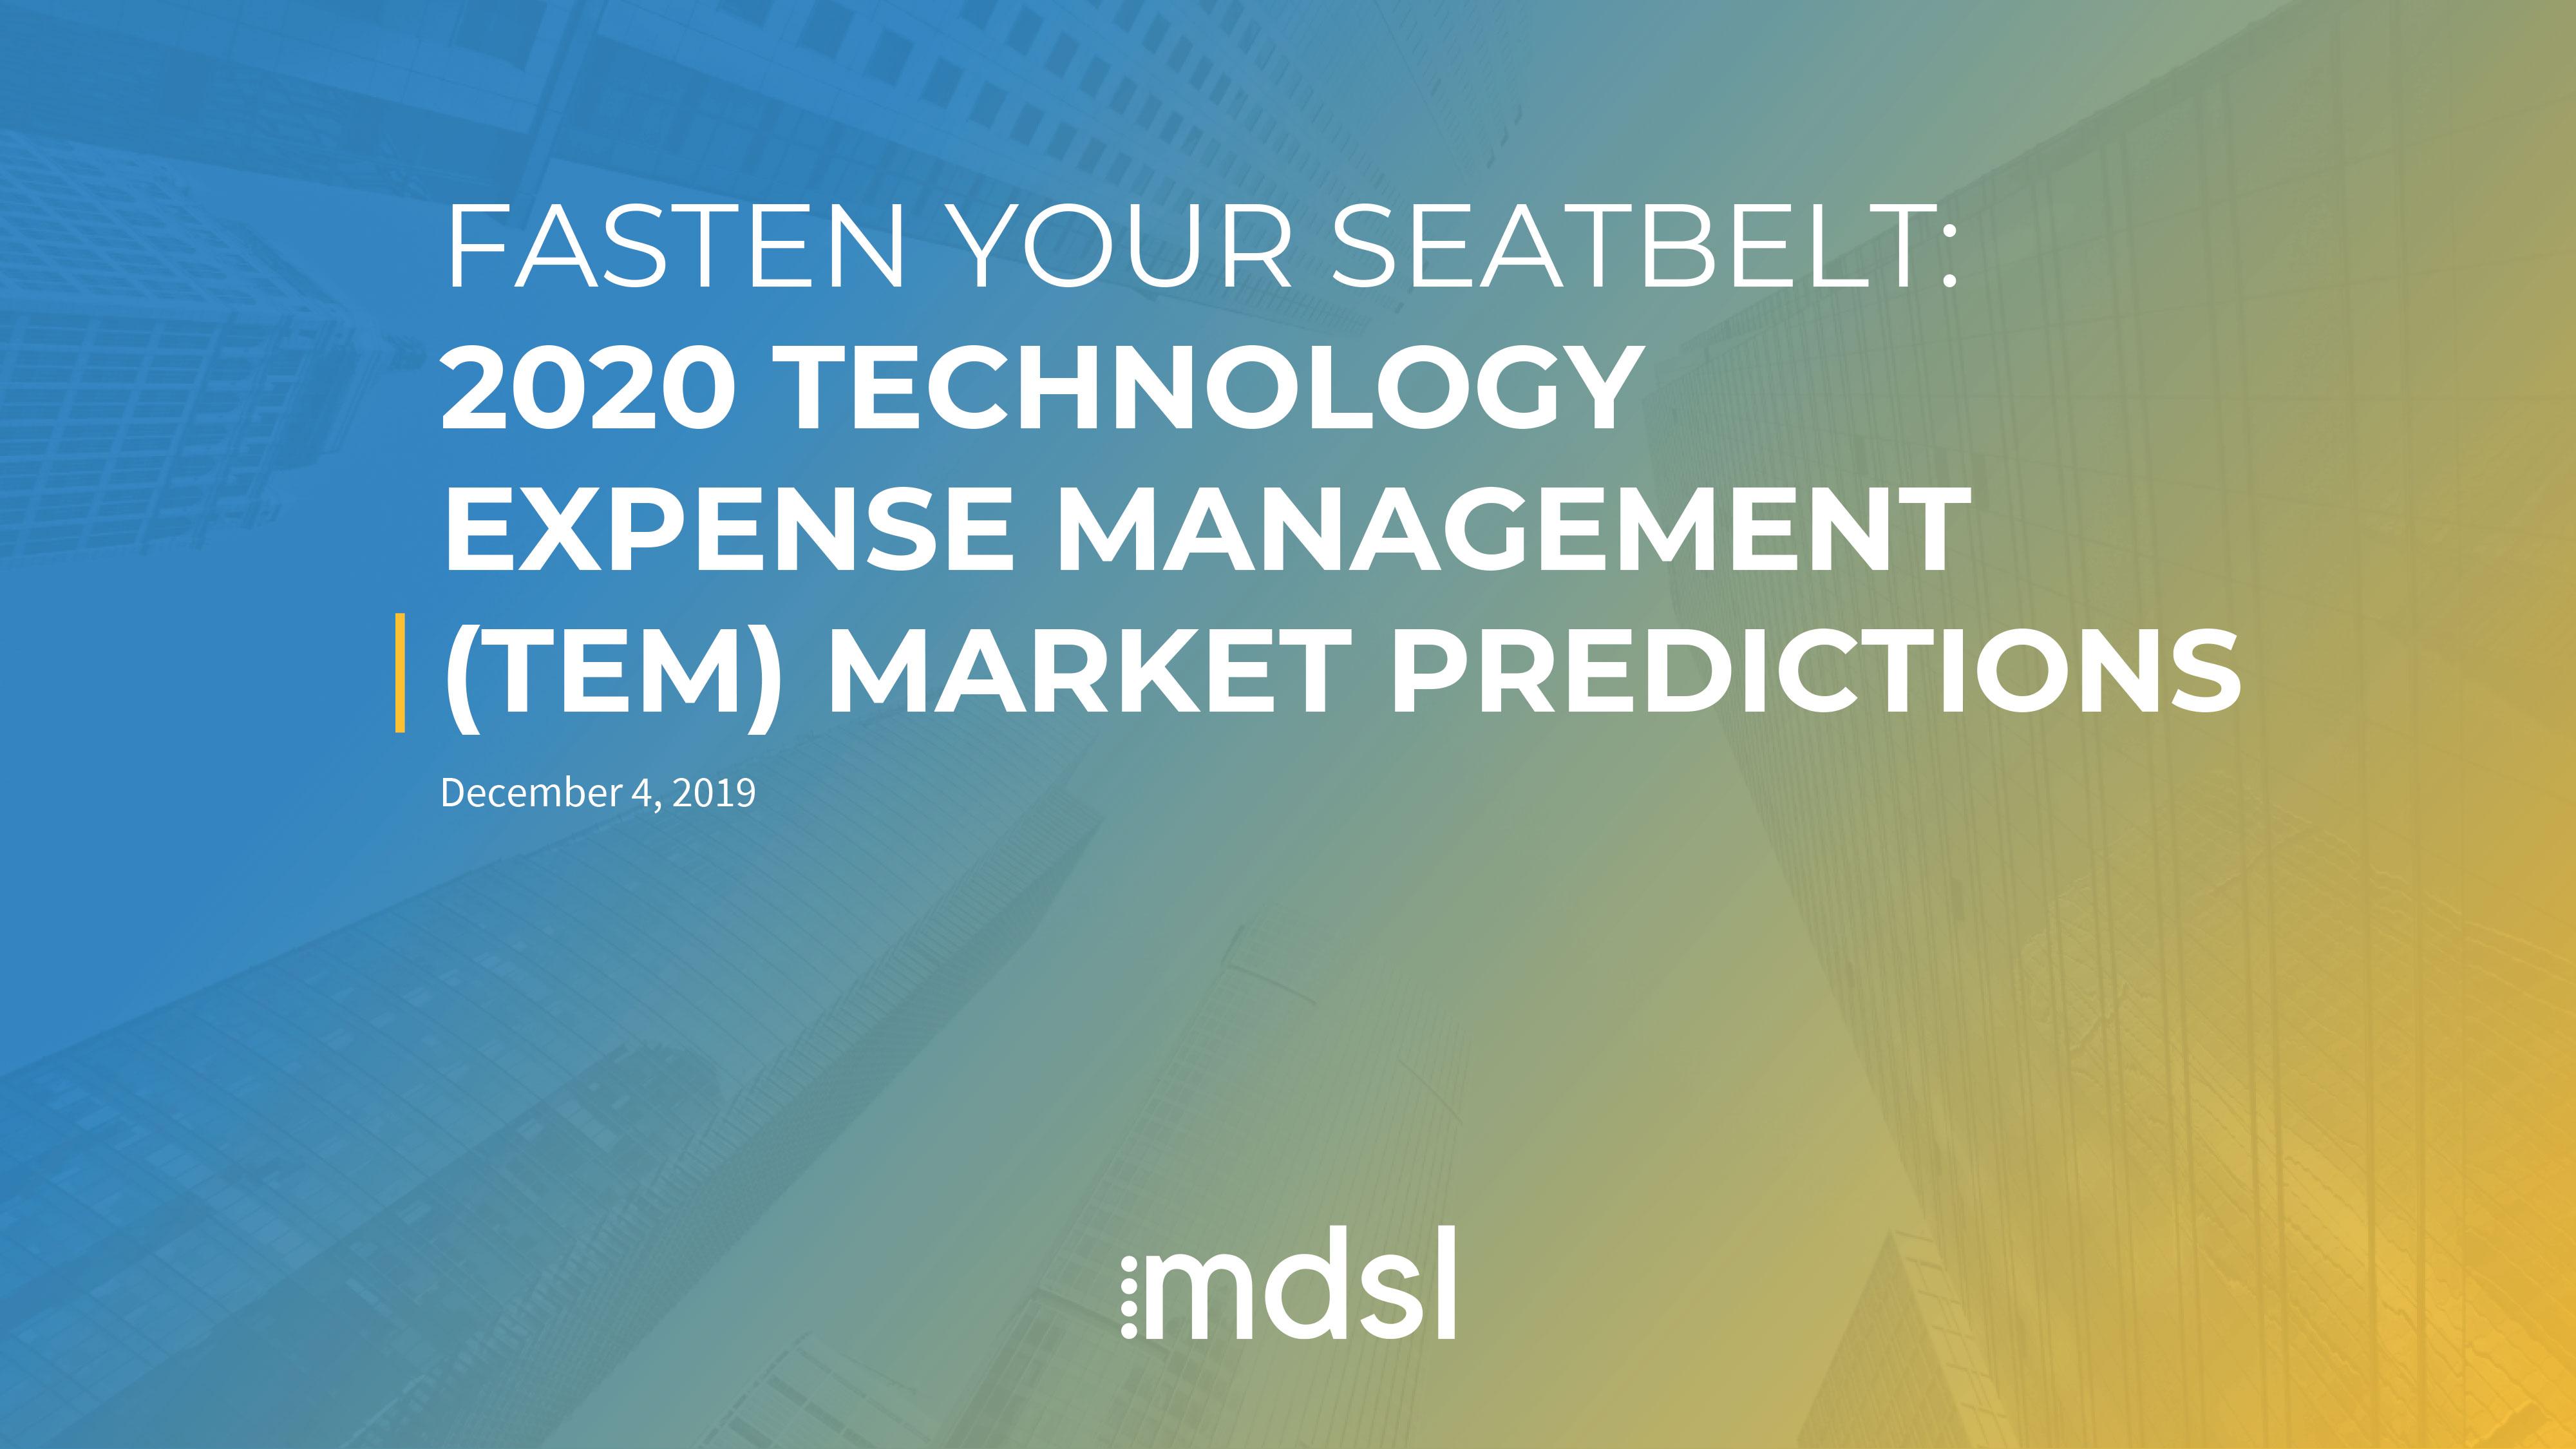 Fasten Your Seatbelt! 2020 Technology Expense Management Market Predictions (EU)